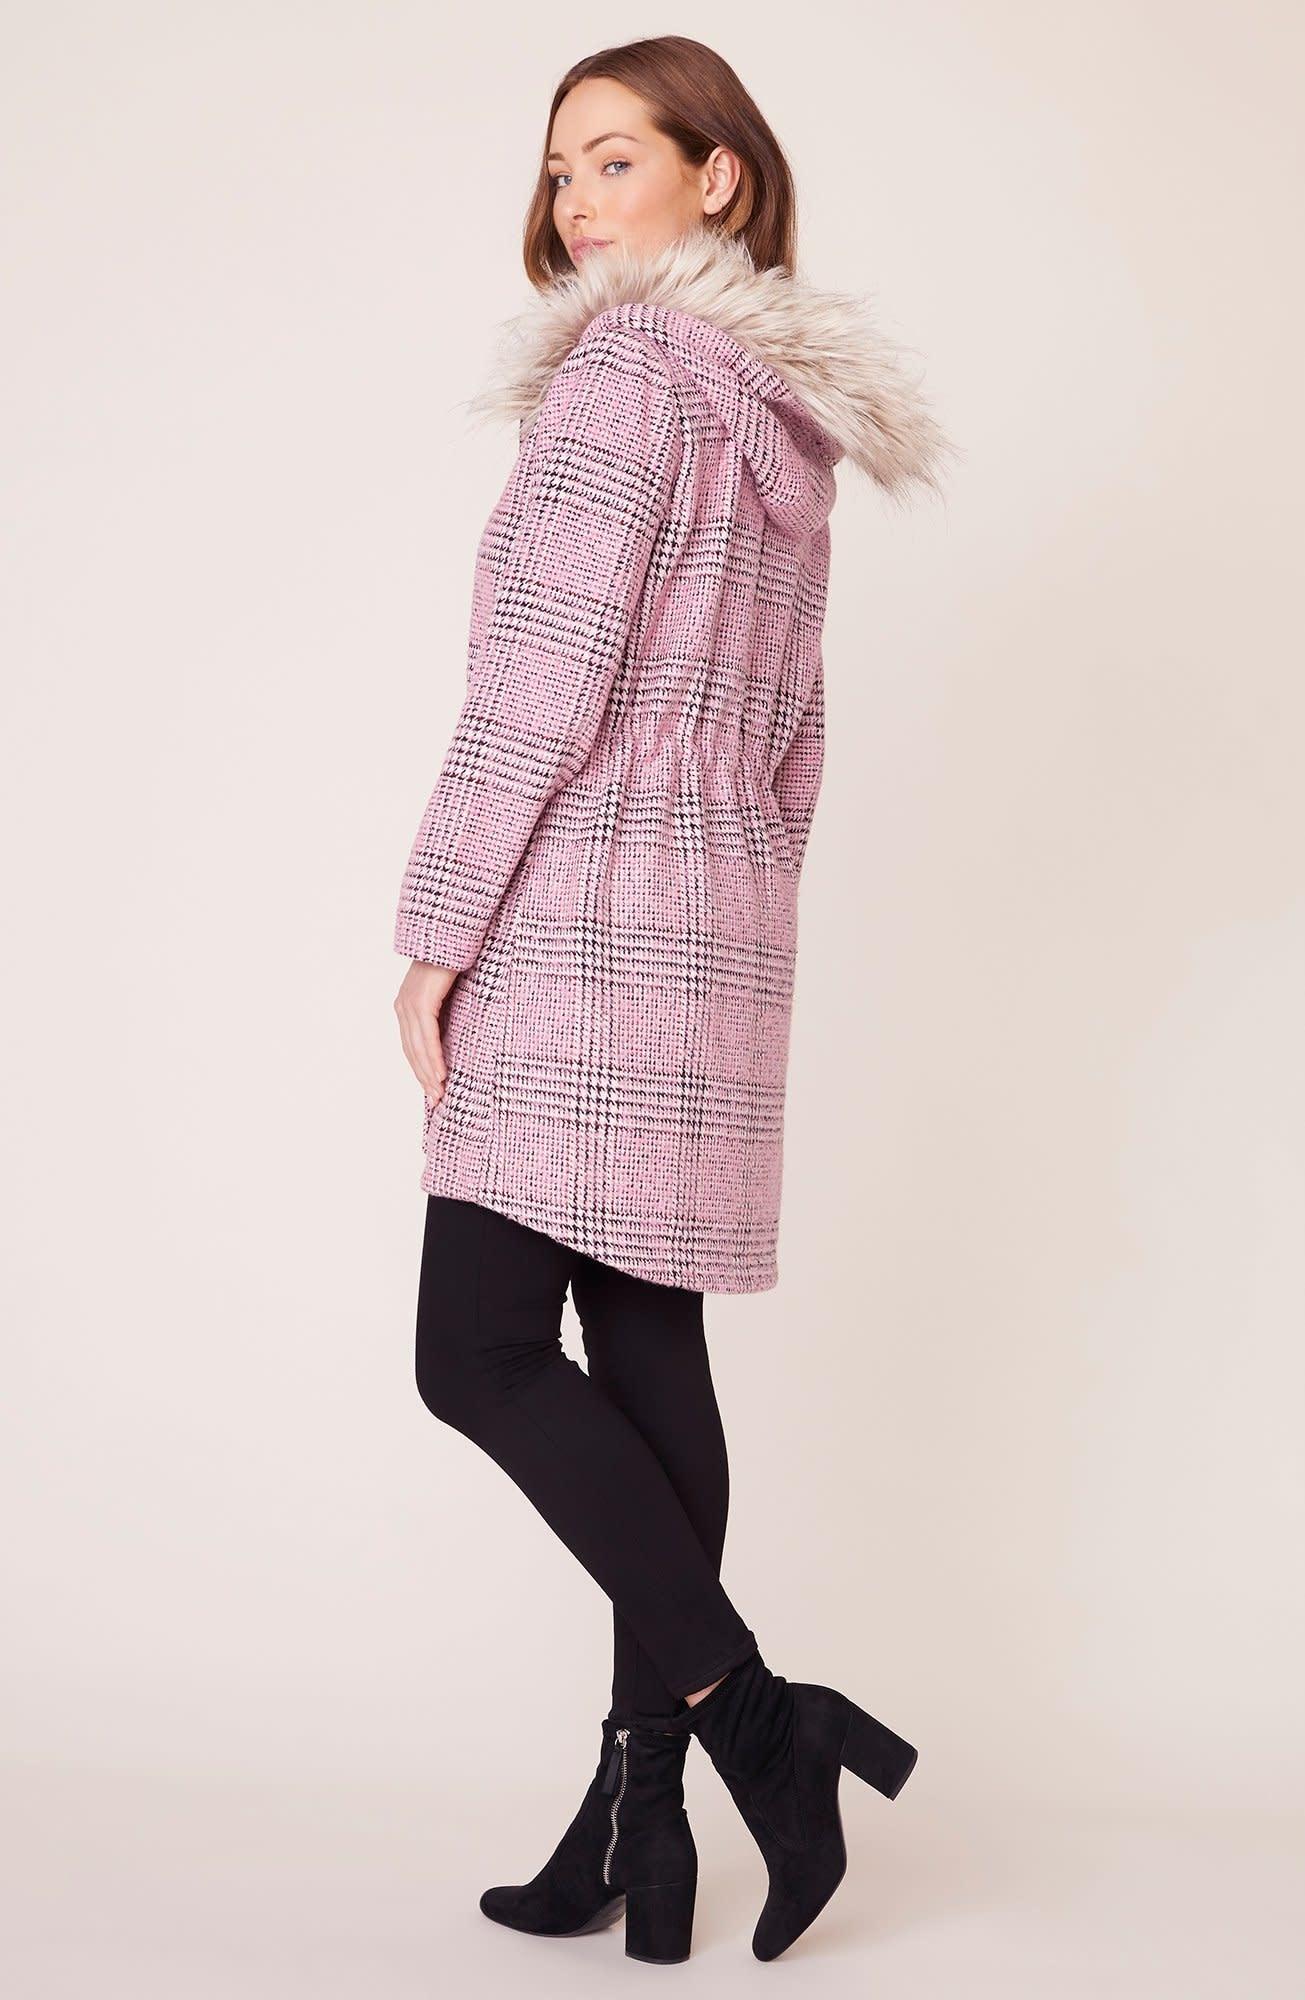 BB Dakota Pink Slip Plaid Coat